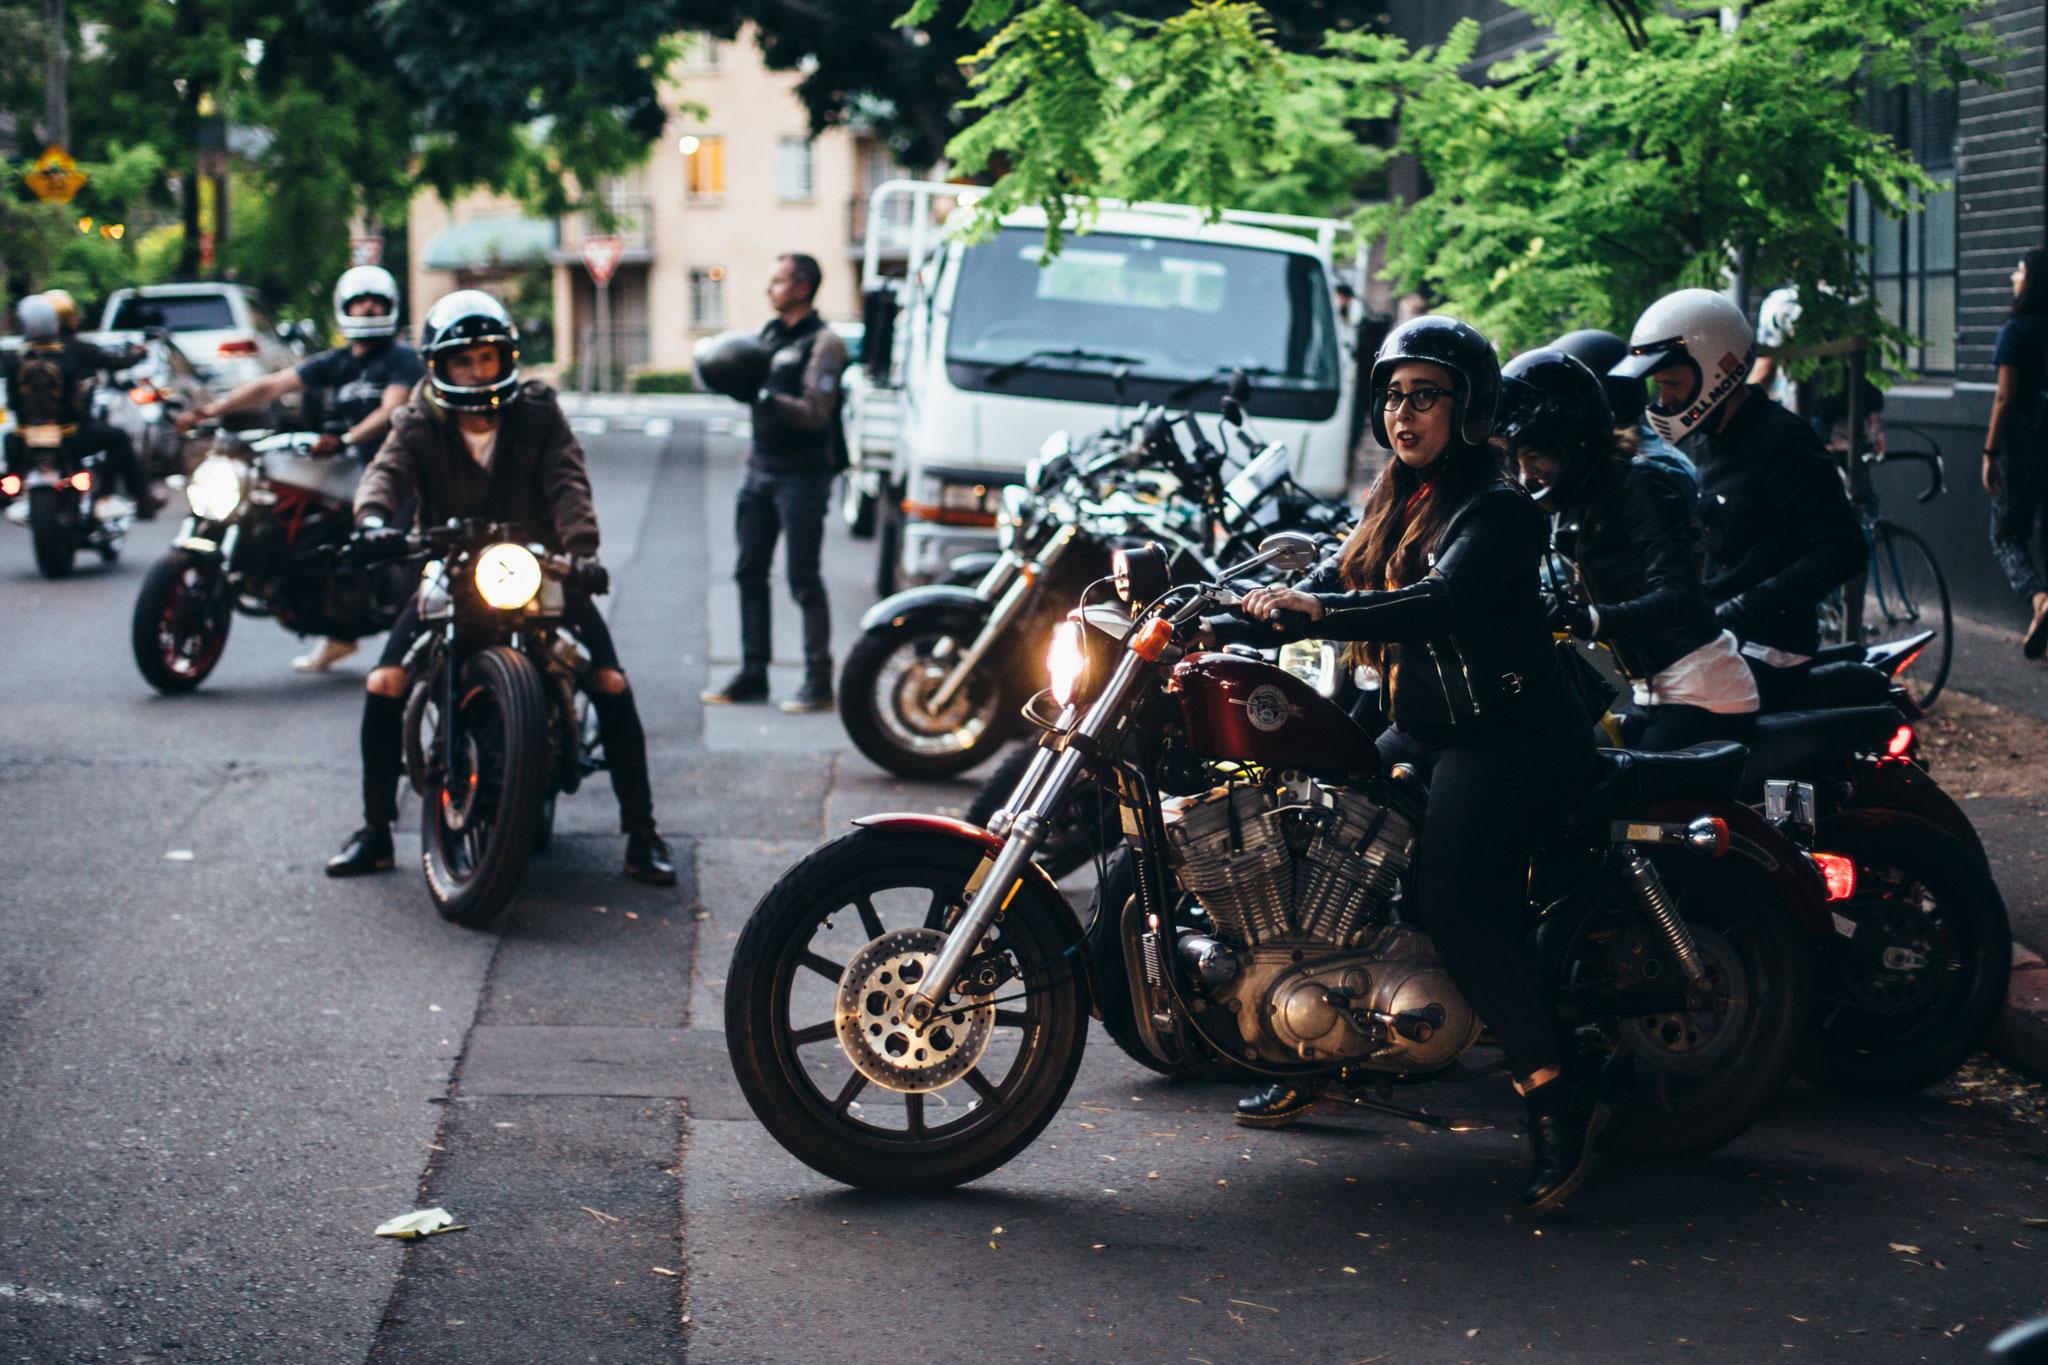 Art Pharamacy_Vandal Gallery_Sabotage MotorcyclesTwenty20_exhibition_6185.jpg